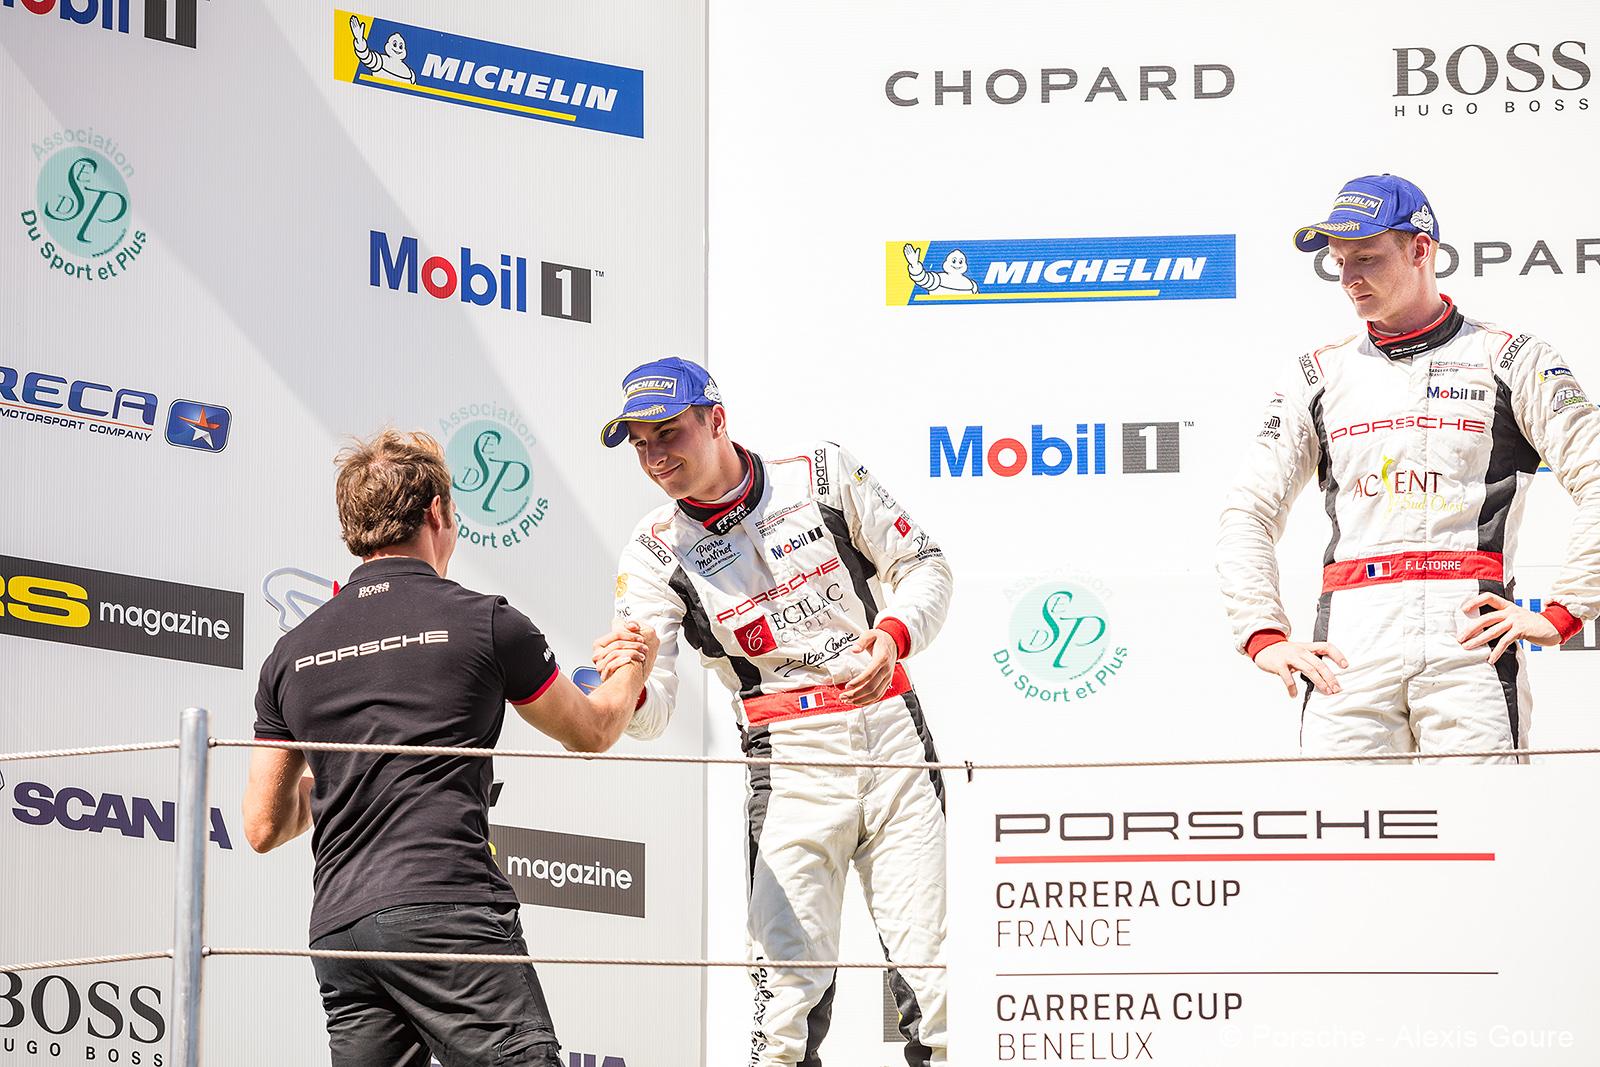 Résultats Porsche Carrera Cup Barcelone !